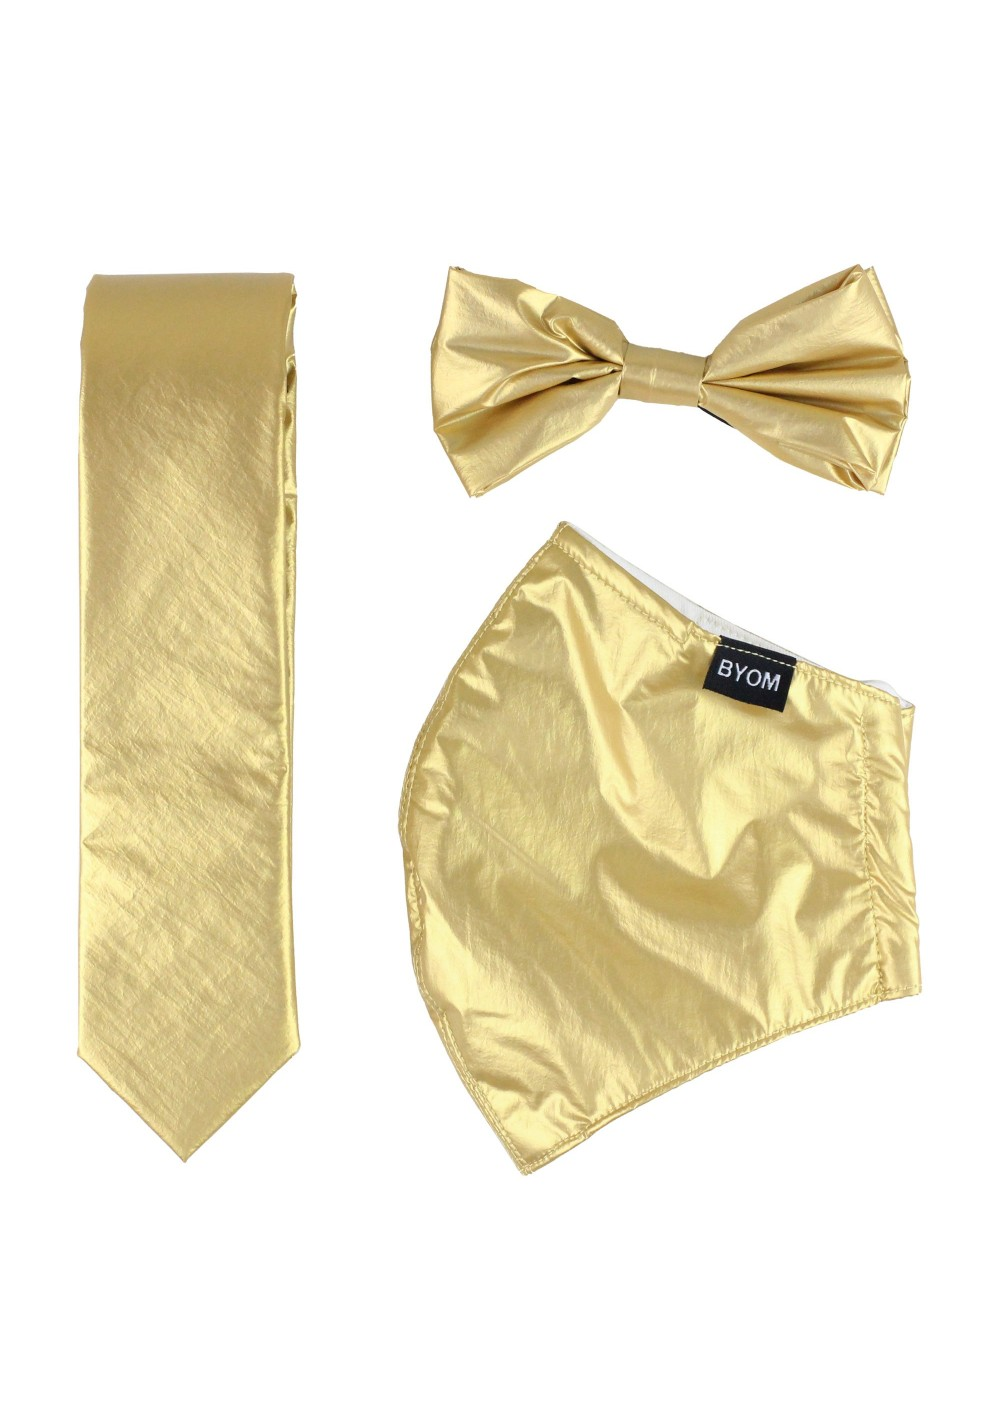 Metallic Gold Mask and Tie Set